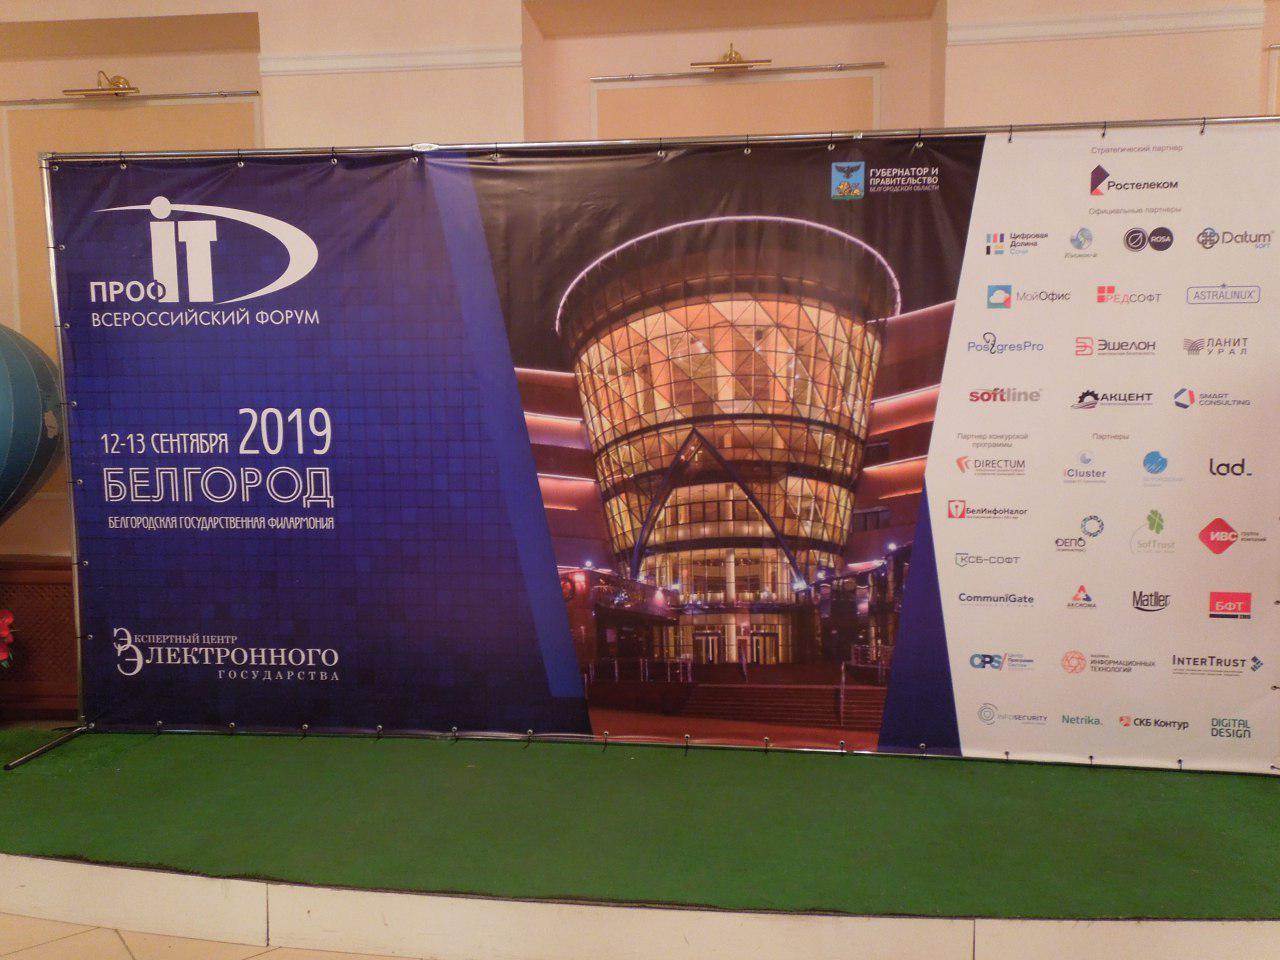 В Белгороде стартовал форум «ПРОФ-IT.2019»